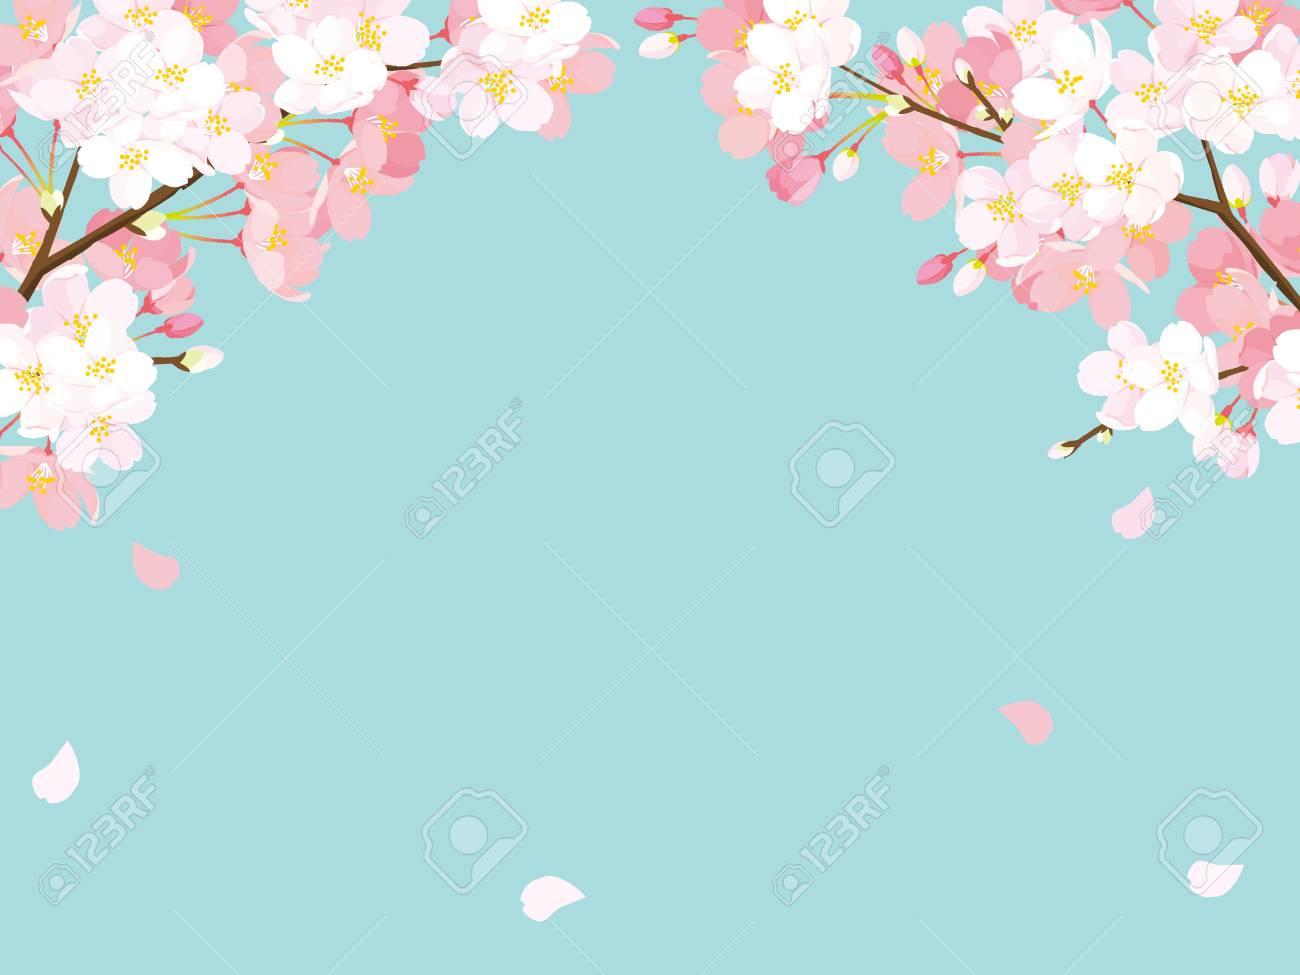 Pink Cherry blossom, Vector Illustration - 93215850